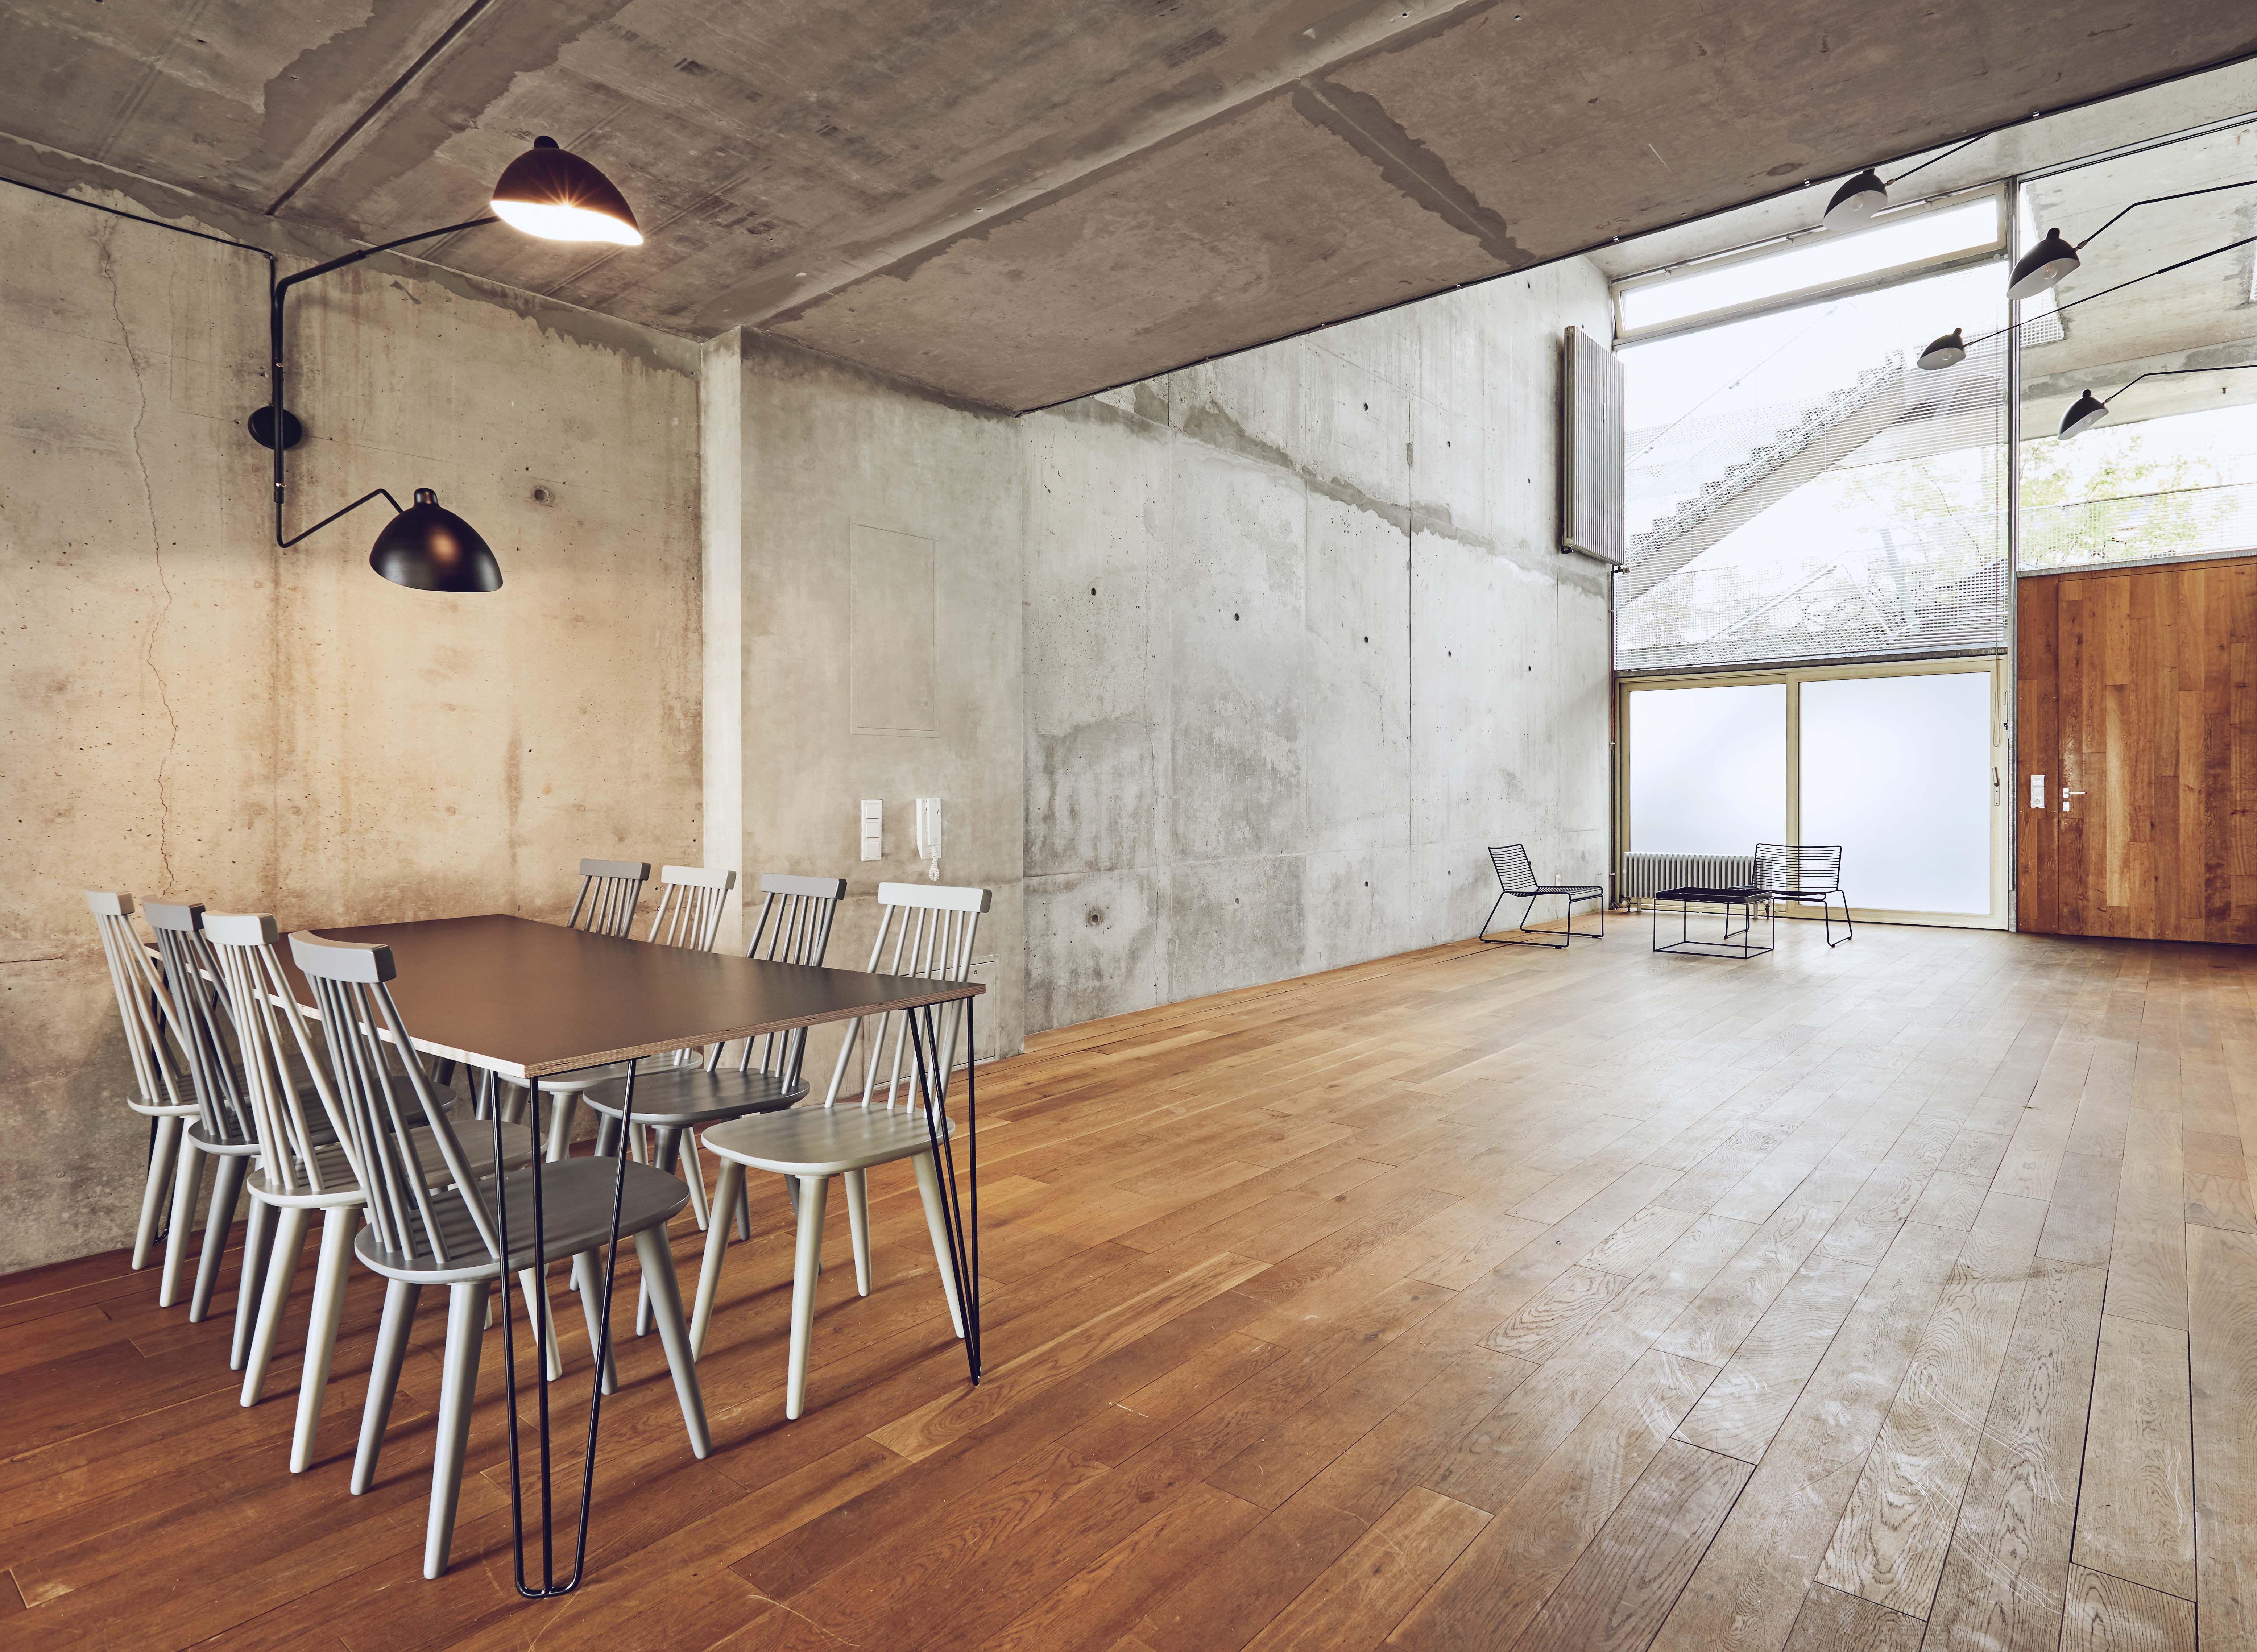 Fotostudio Tageslichtstudio Mietstudio Daylight Arno Brandlhuber Am Klner Brett Kln